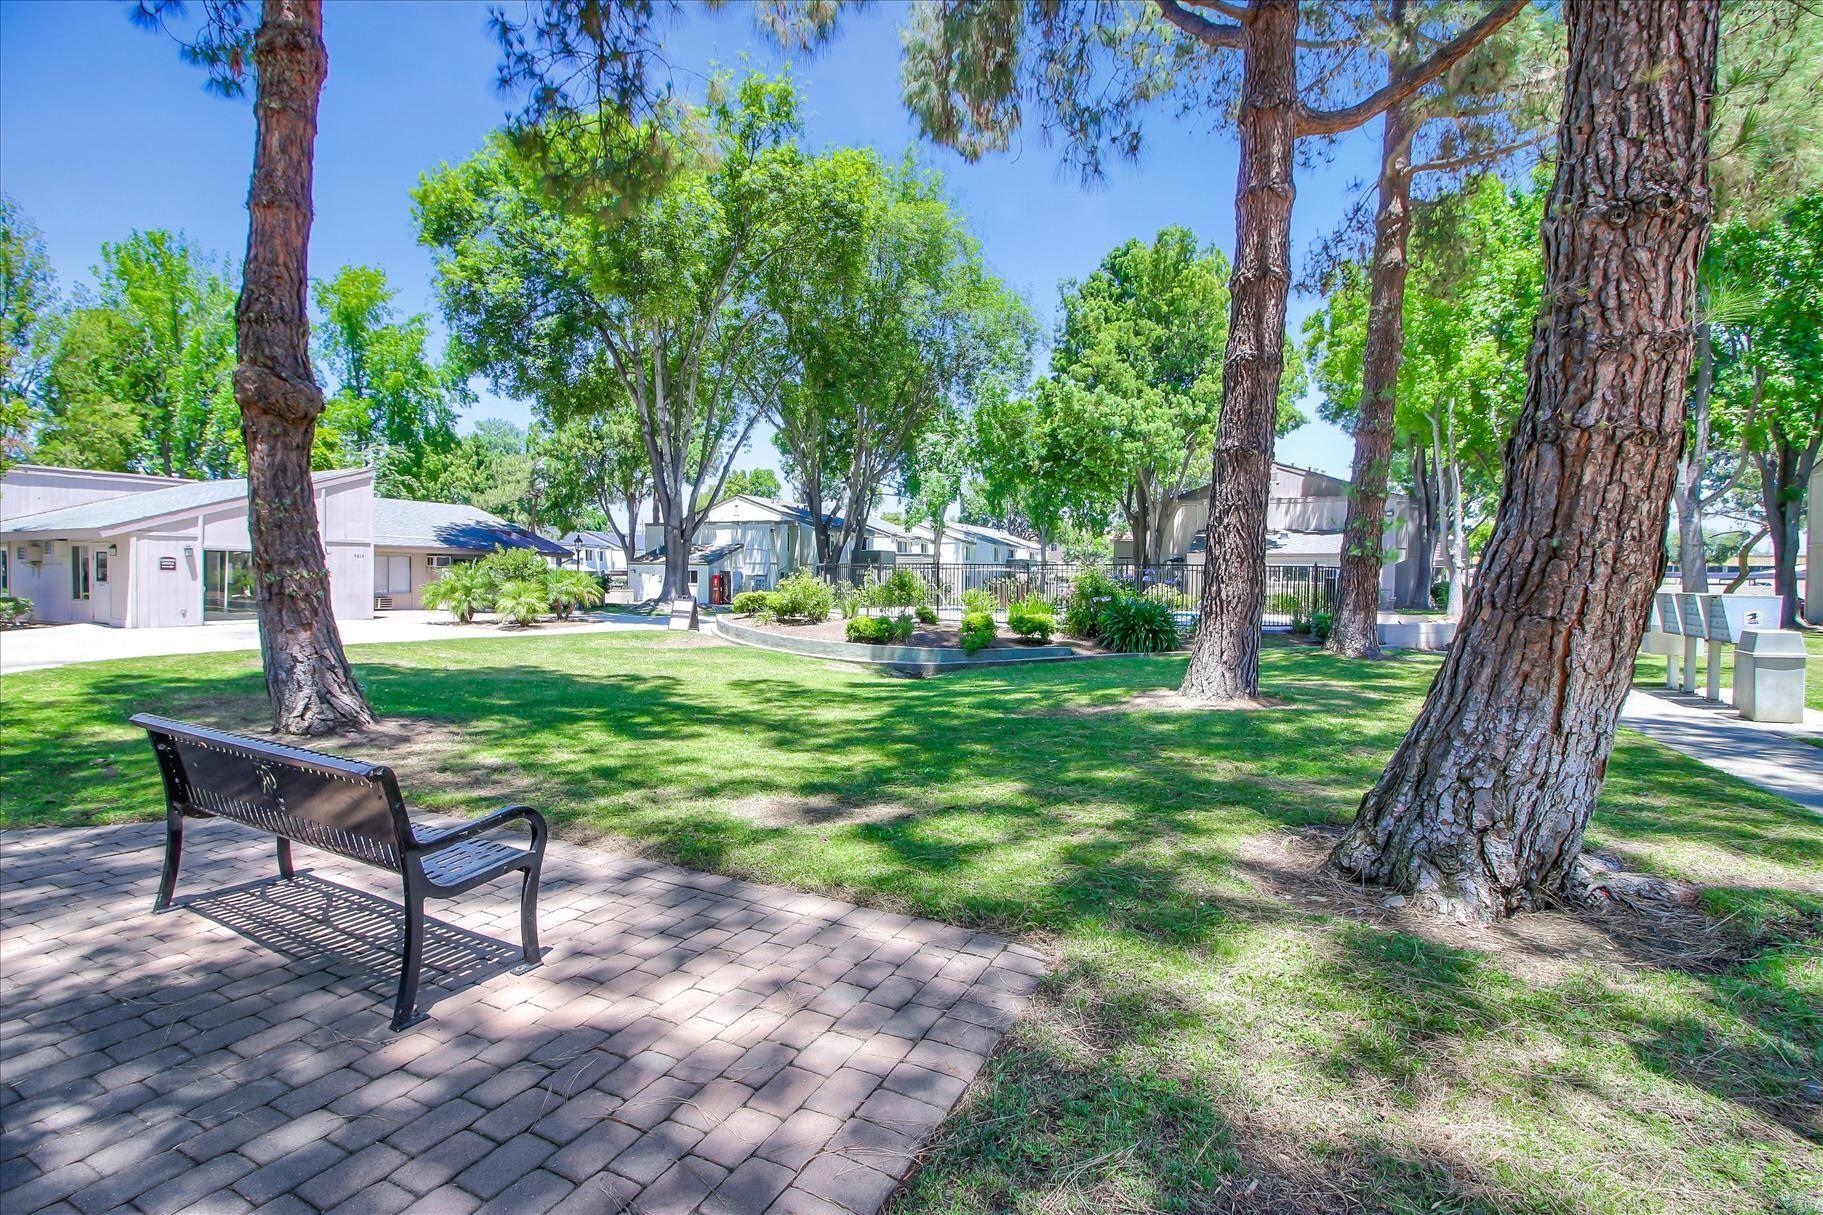 Village Green Apartments - San Jose, CA Apartments for rent